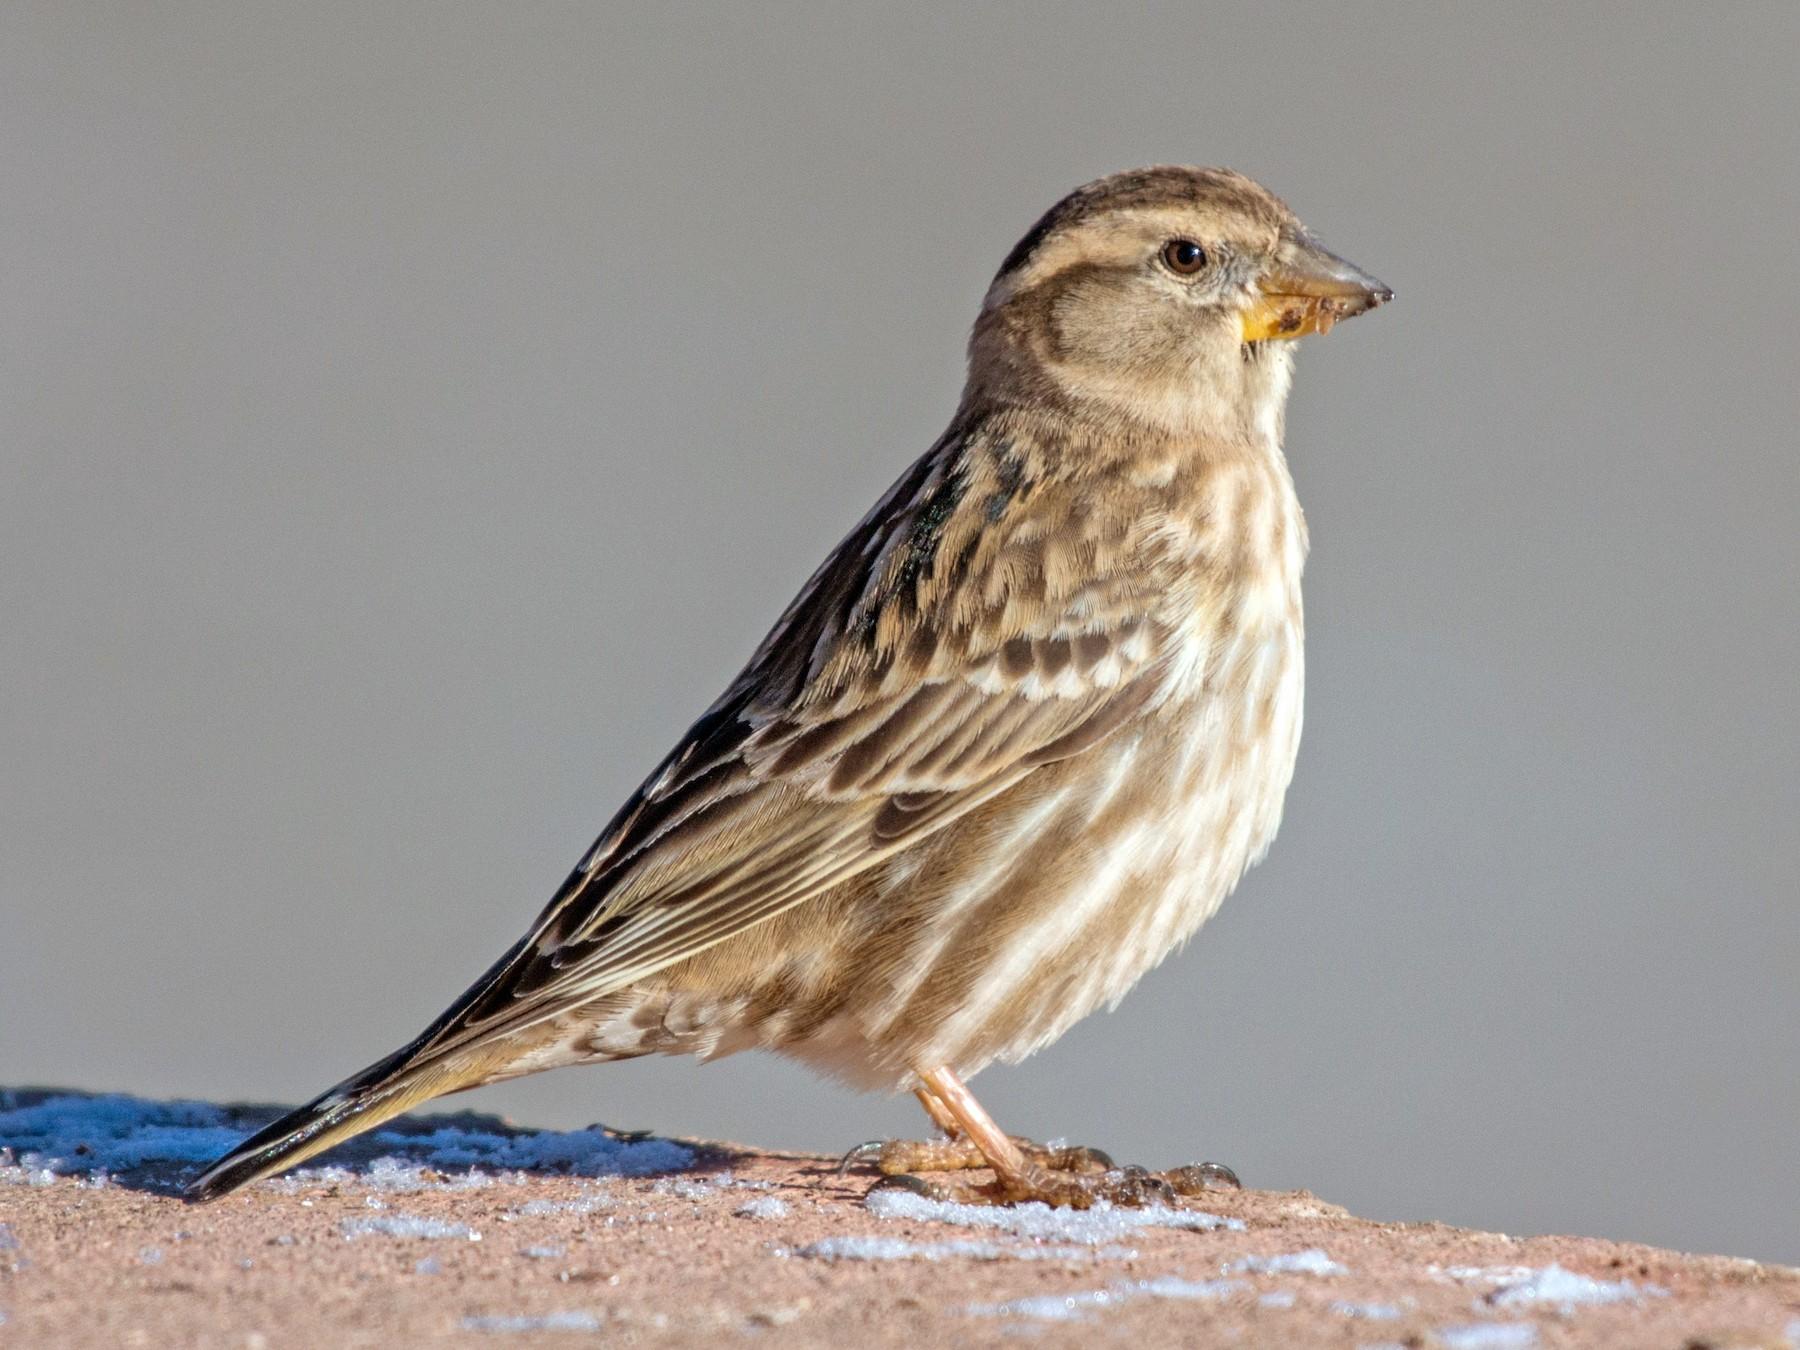 Rock Sparrow - John C. Mittermeier